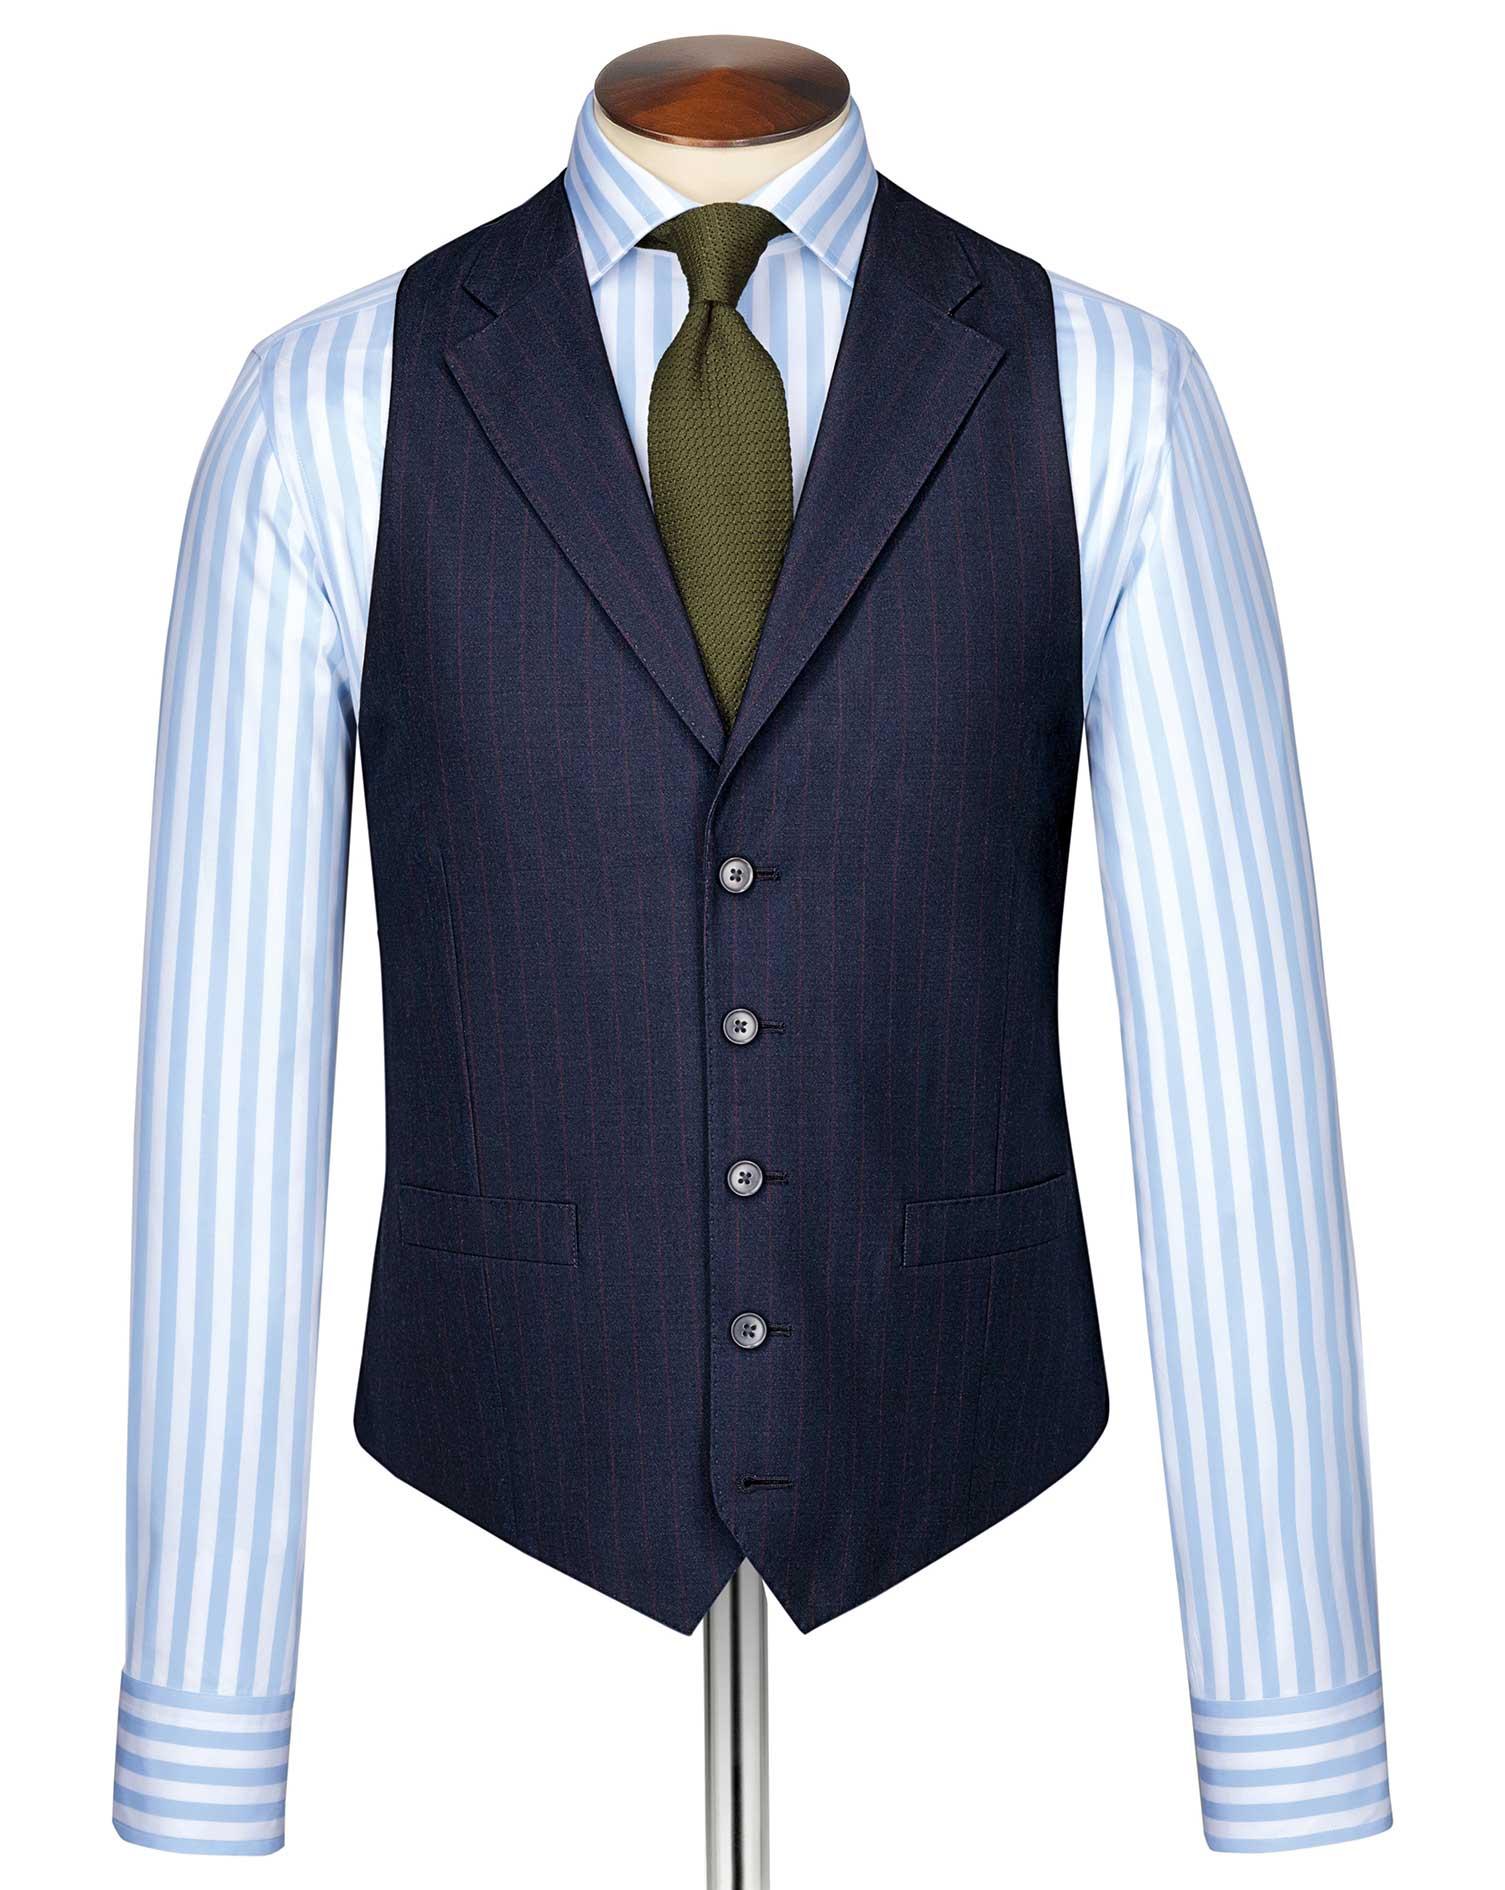 Blue Panama Business Suit Wool Waistcoat Size w38 by Charles Tyrwhitt